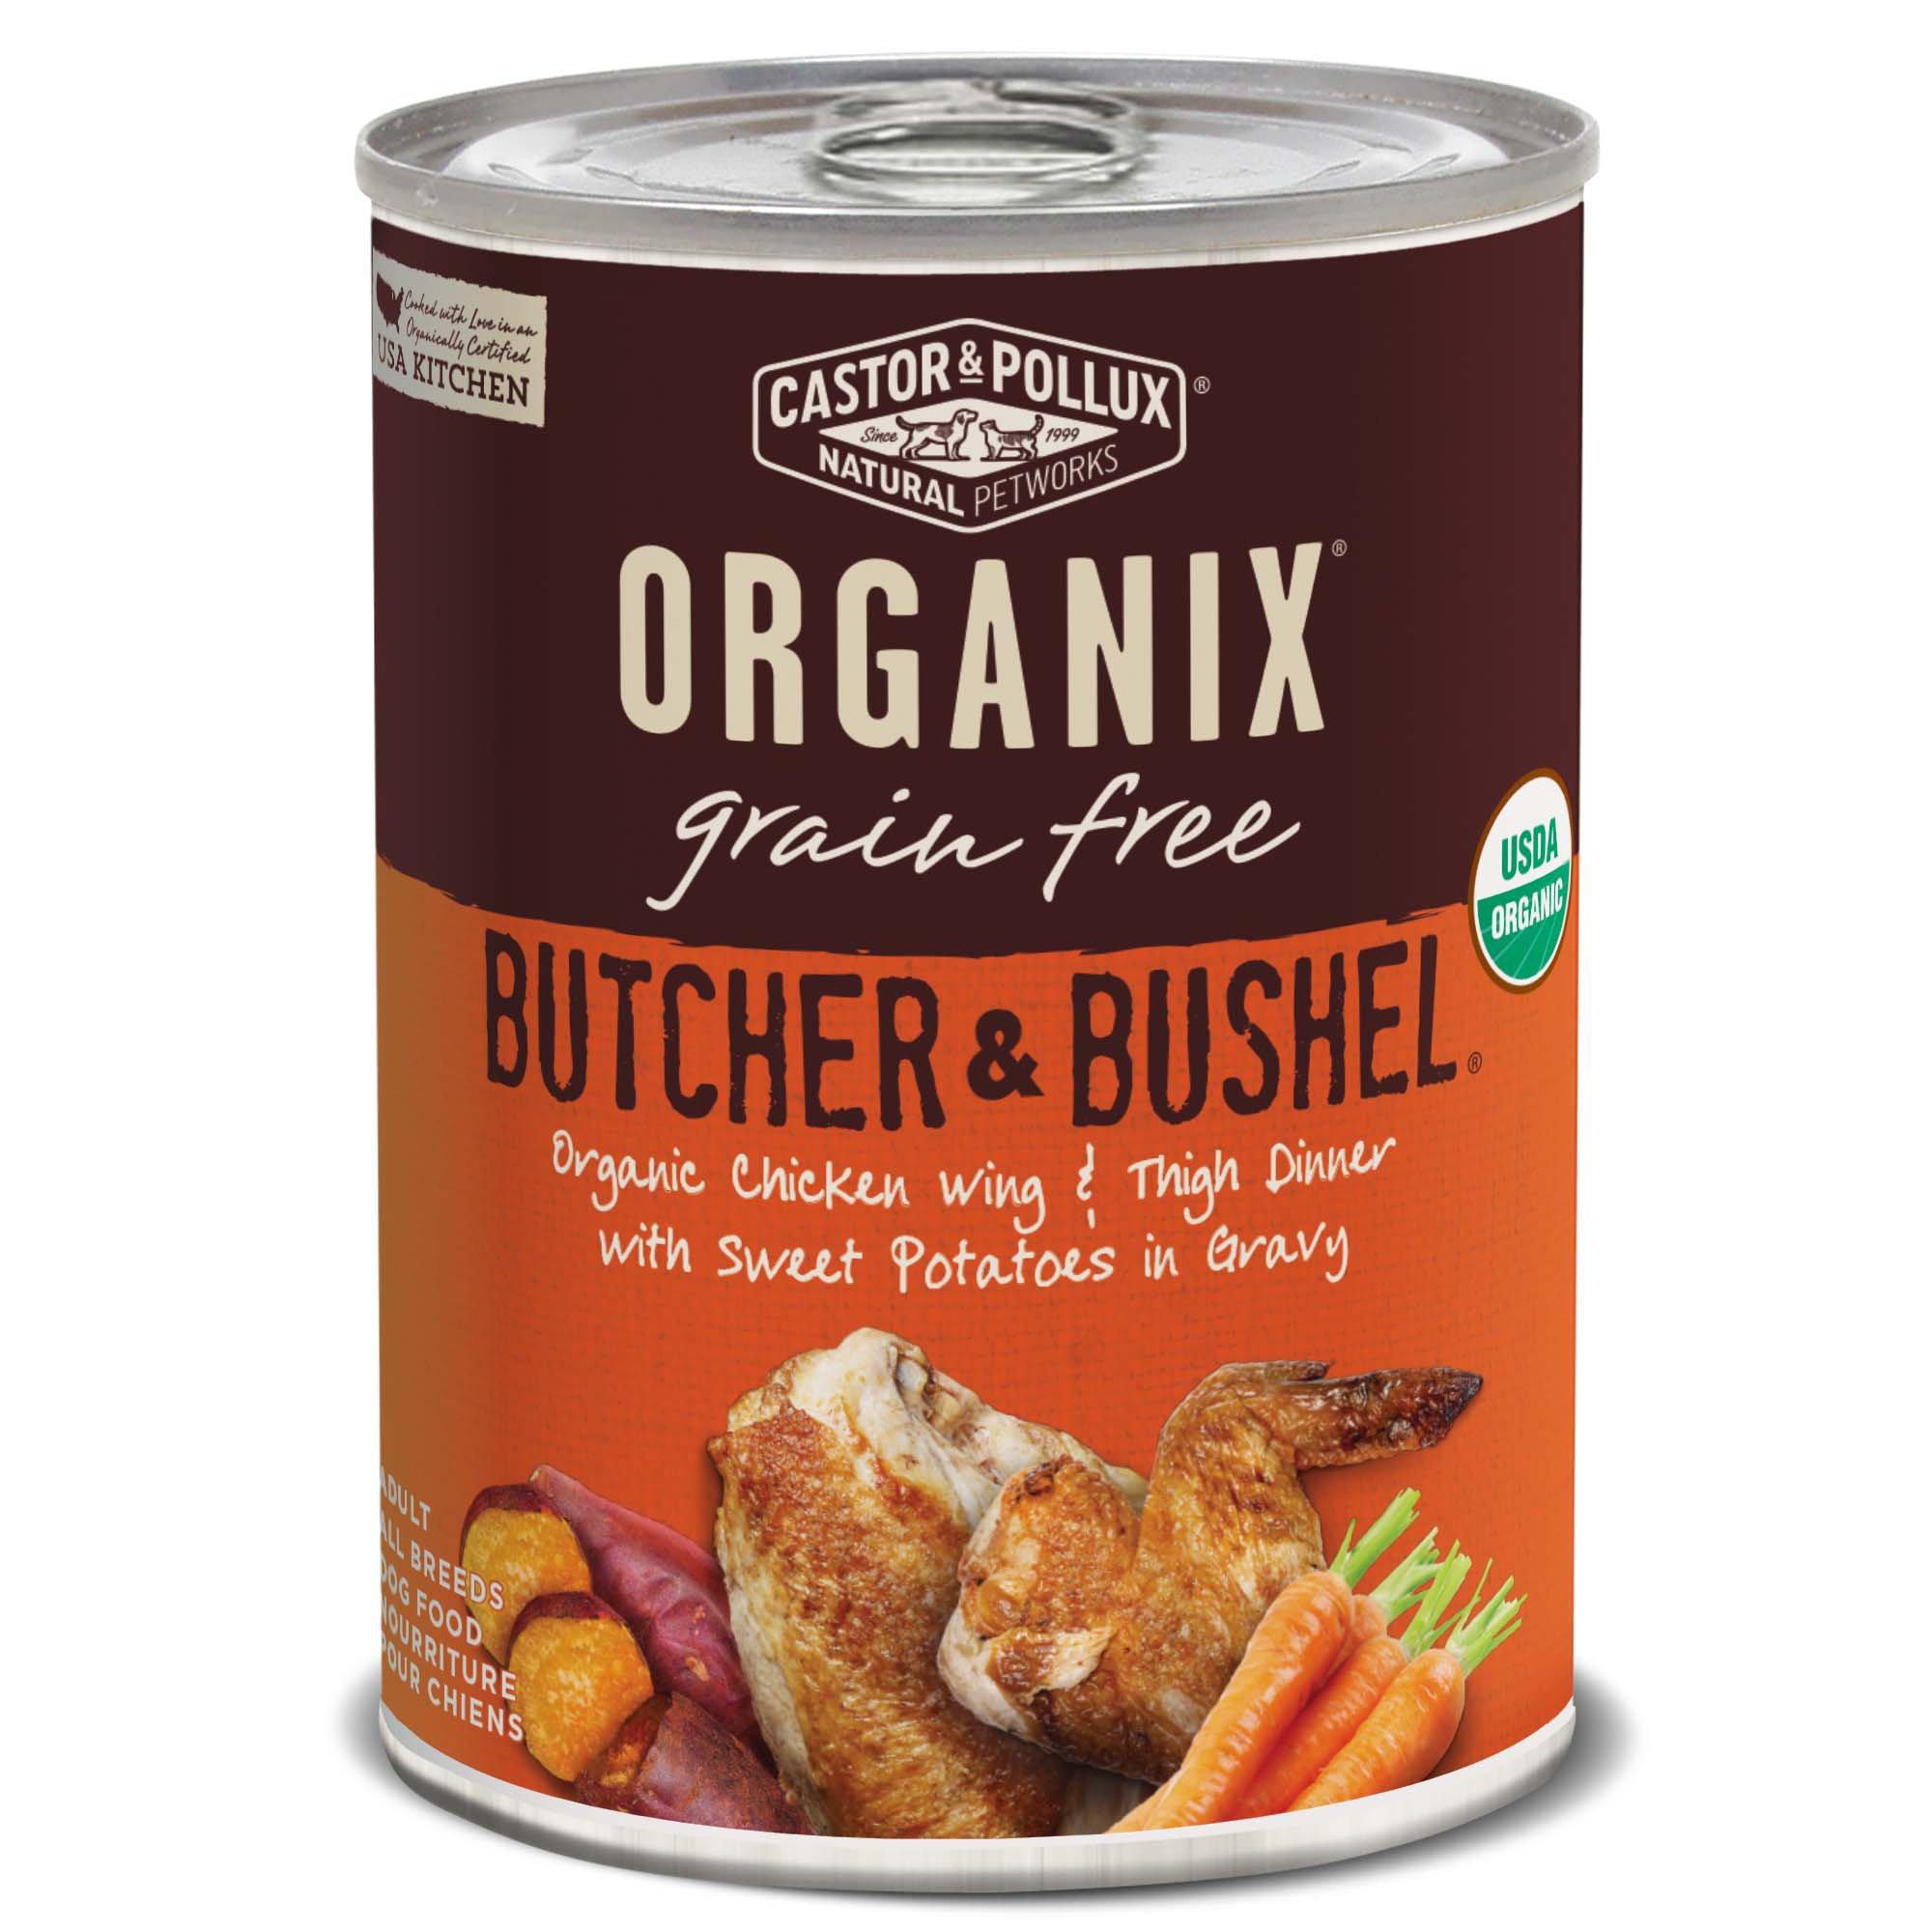 Image of Castor & Pollux Organix Butcher & Bushel Organic Chicken Wing & Thigh Dinner Wet Dog Food, 12.7 oz., Case of 12, 12 X 12.7 OZ